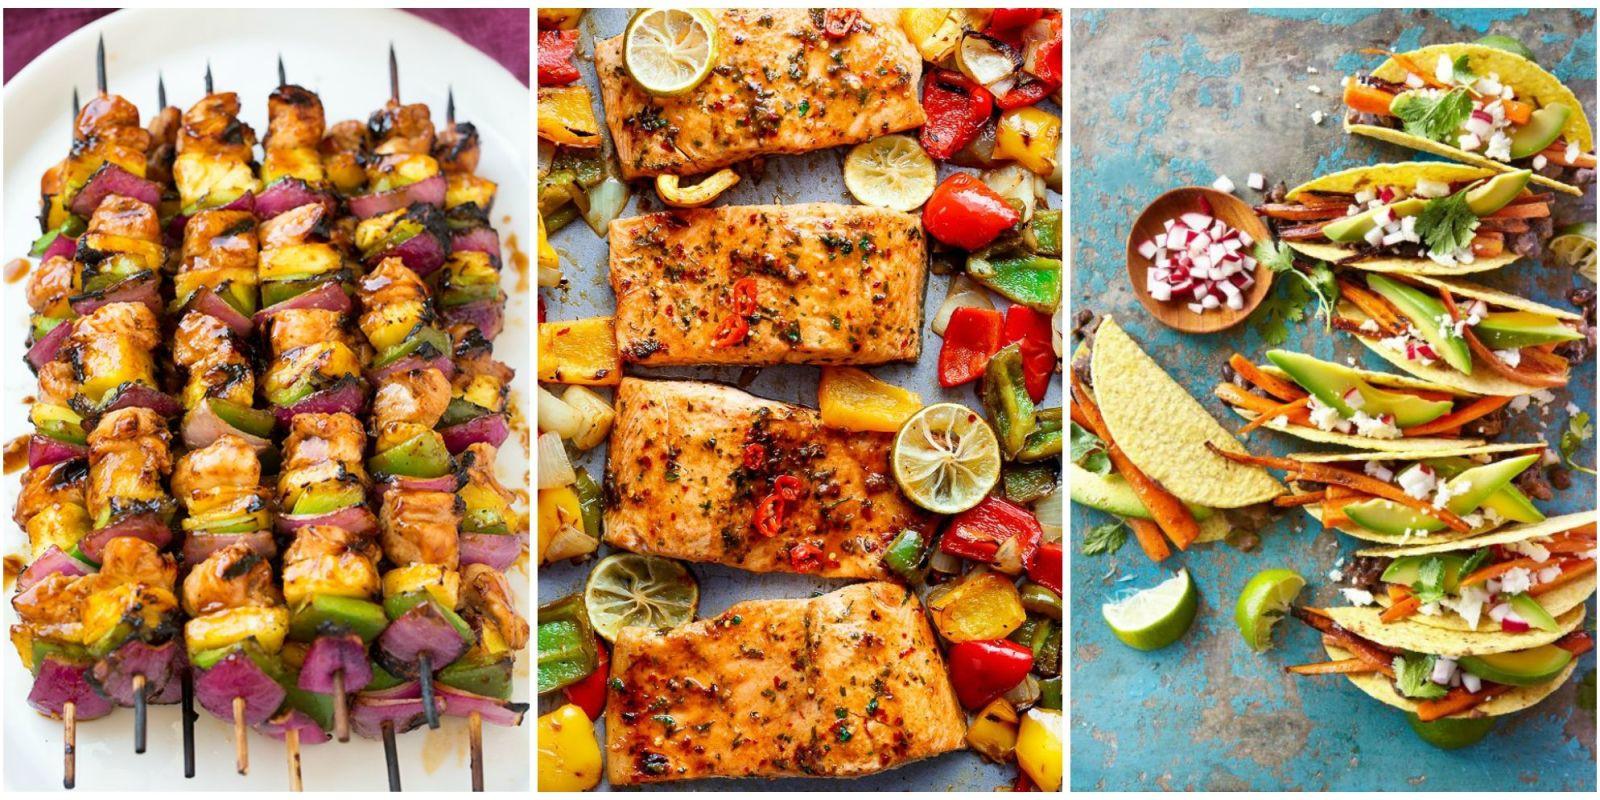 Good Summer Dinners Recipes  14 Easy Summer Dinner Ideas Best Recipes for Summer Dinners